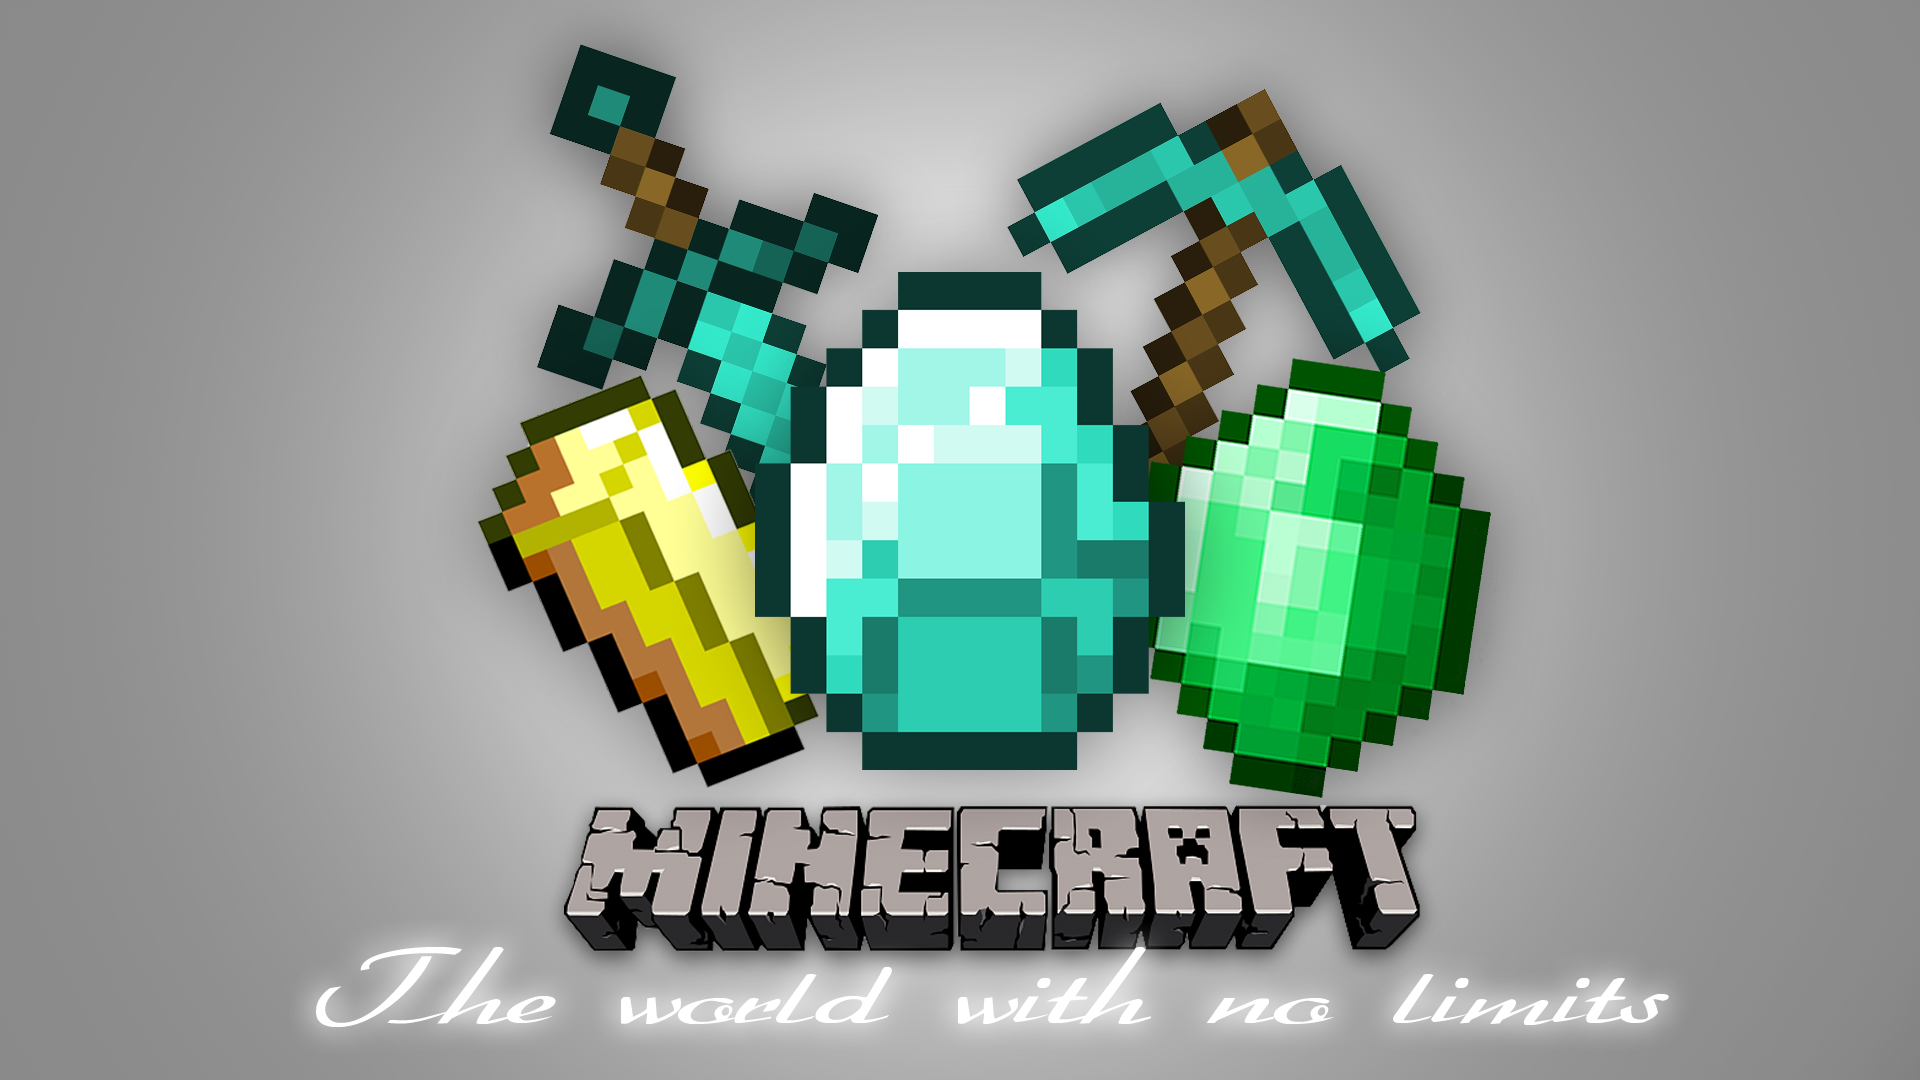 Top Wallpaper Minecraft Gold - minecraft_no_limits_wallpaper_by_coperaxe-d5et6gm  Graphic_275659.png